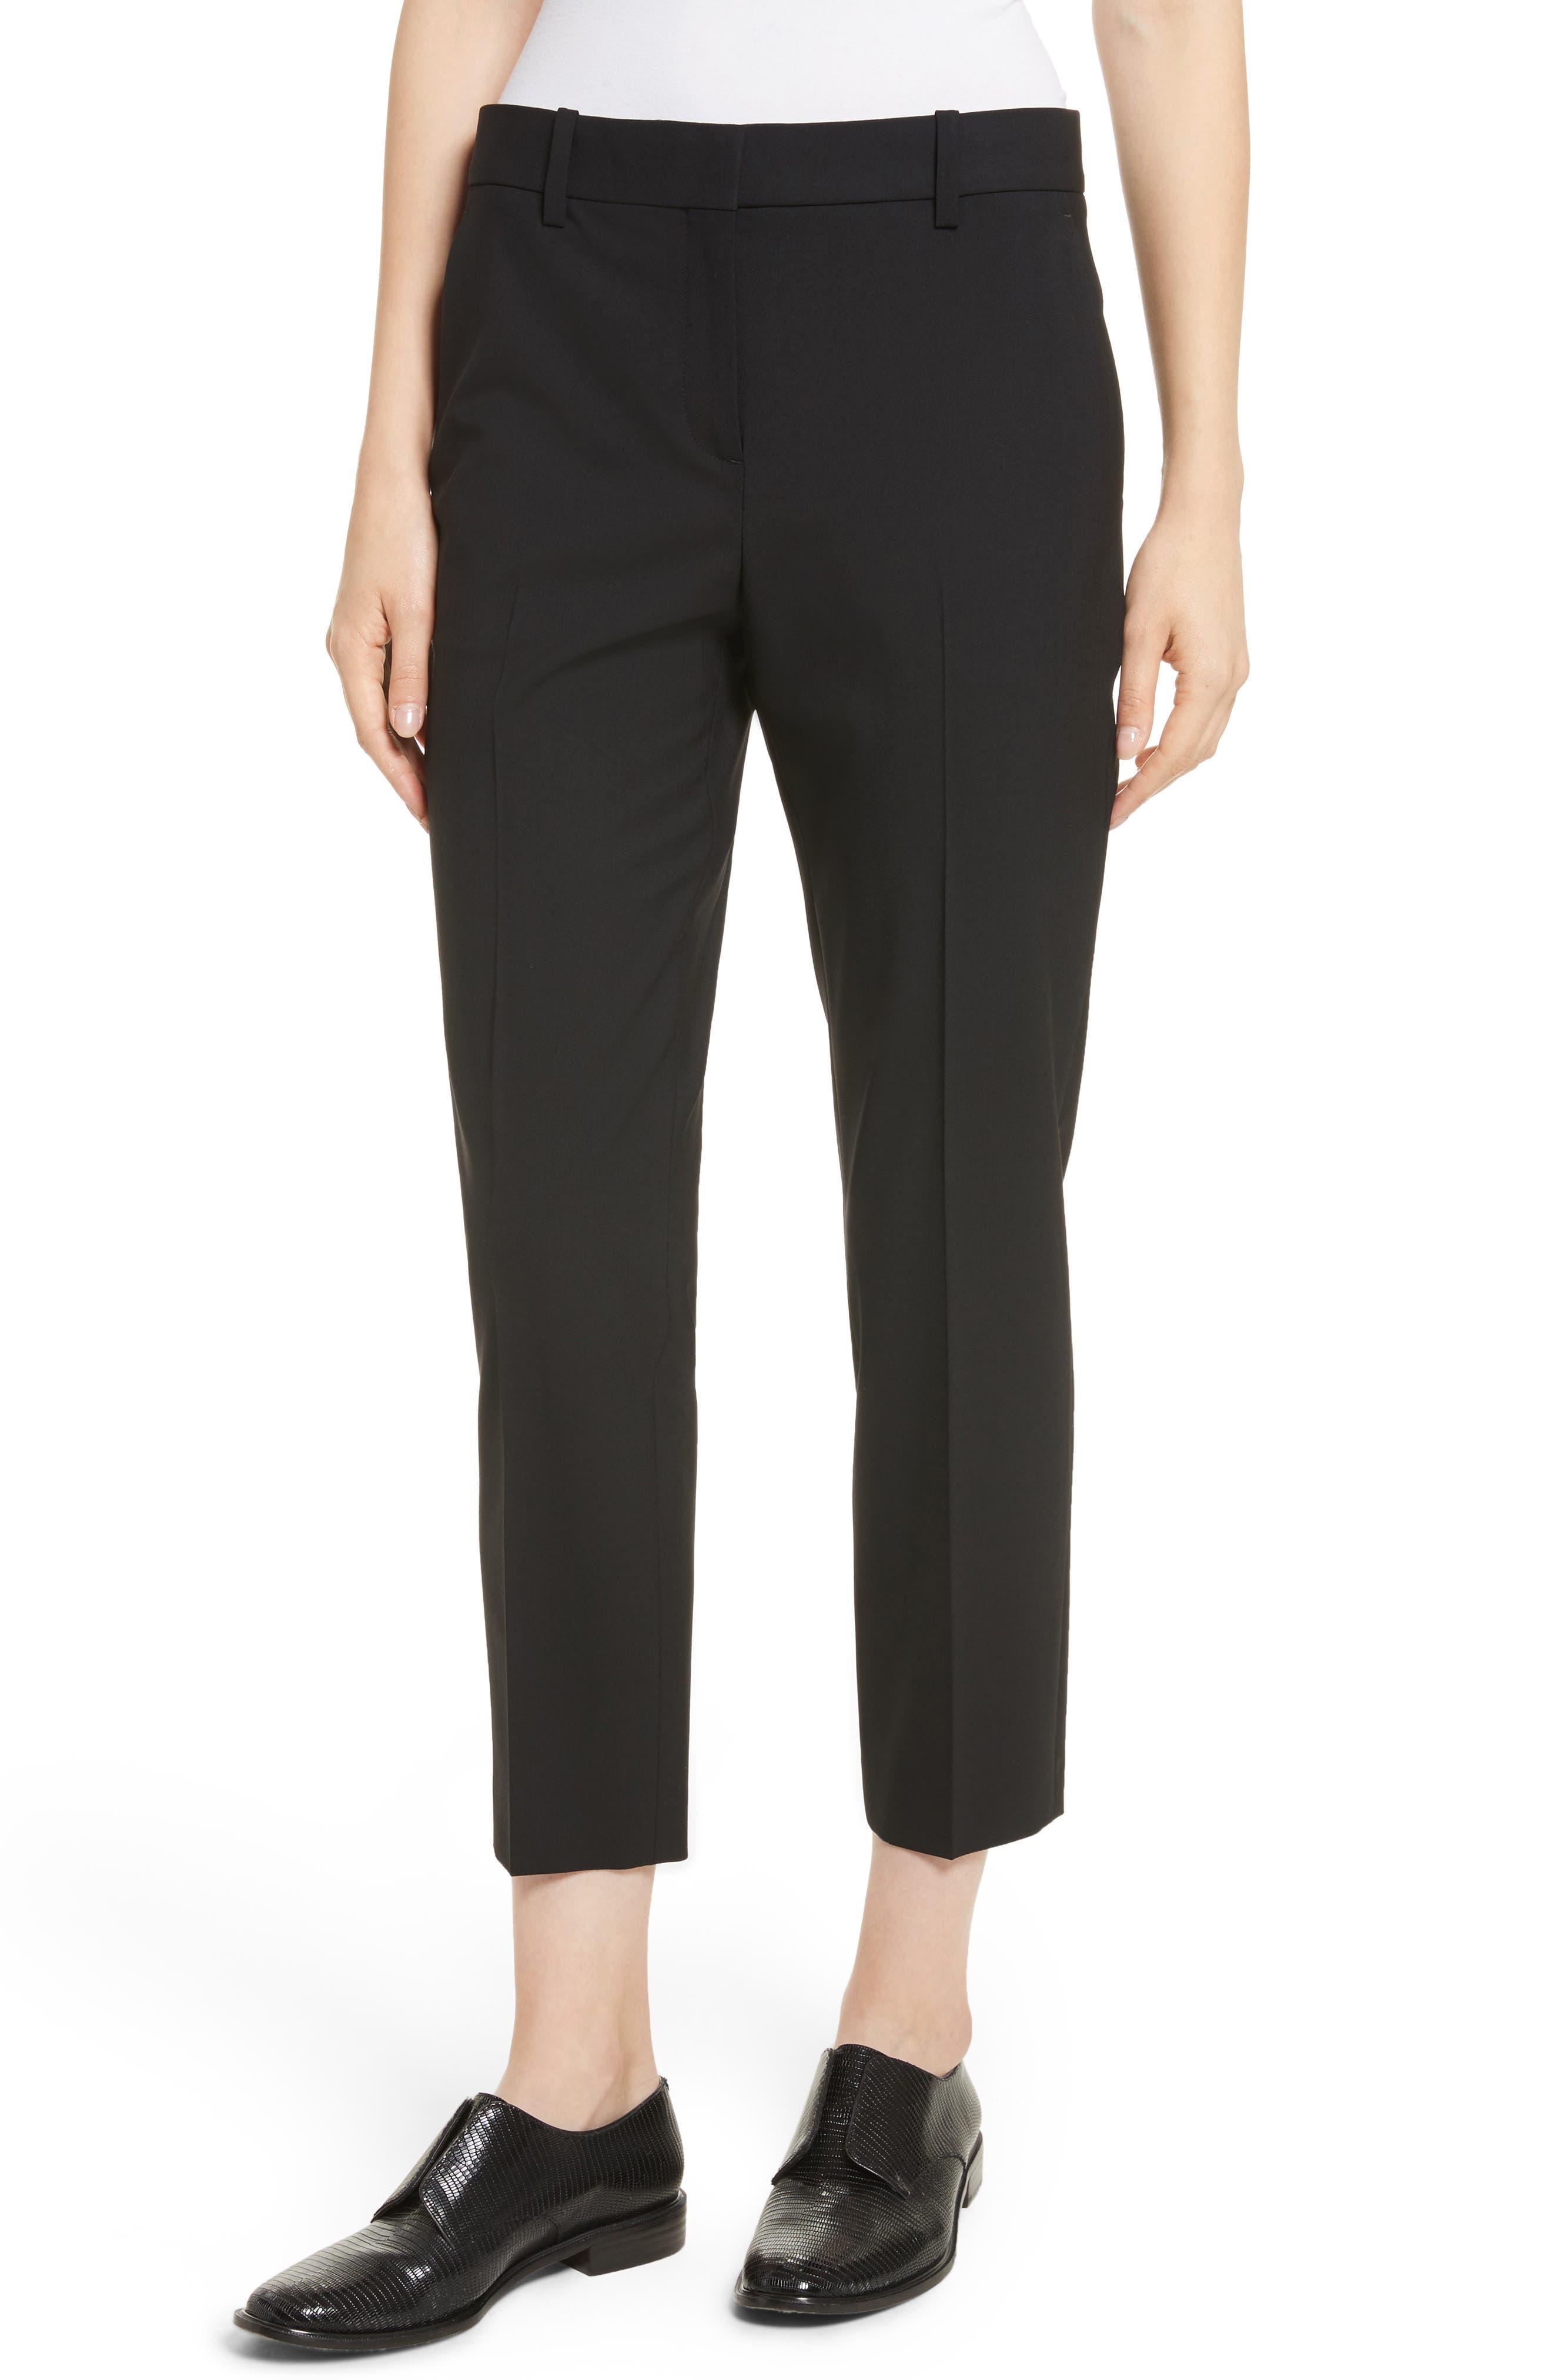 THEORY, Treeca 2 Good Wool Crop Suit Pants, Main thumbnail 1, color, BLACK